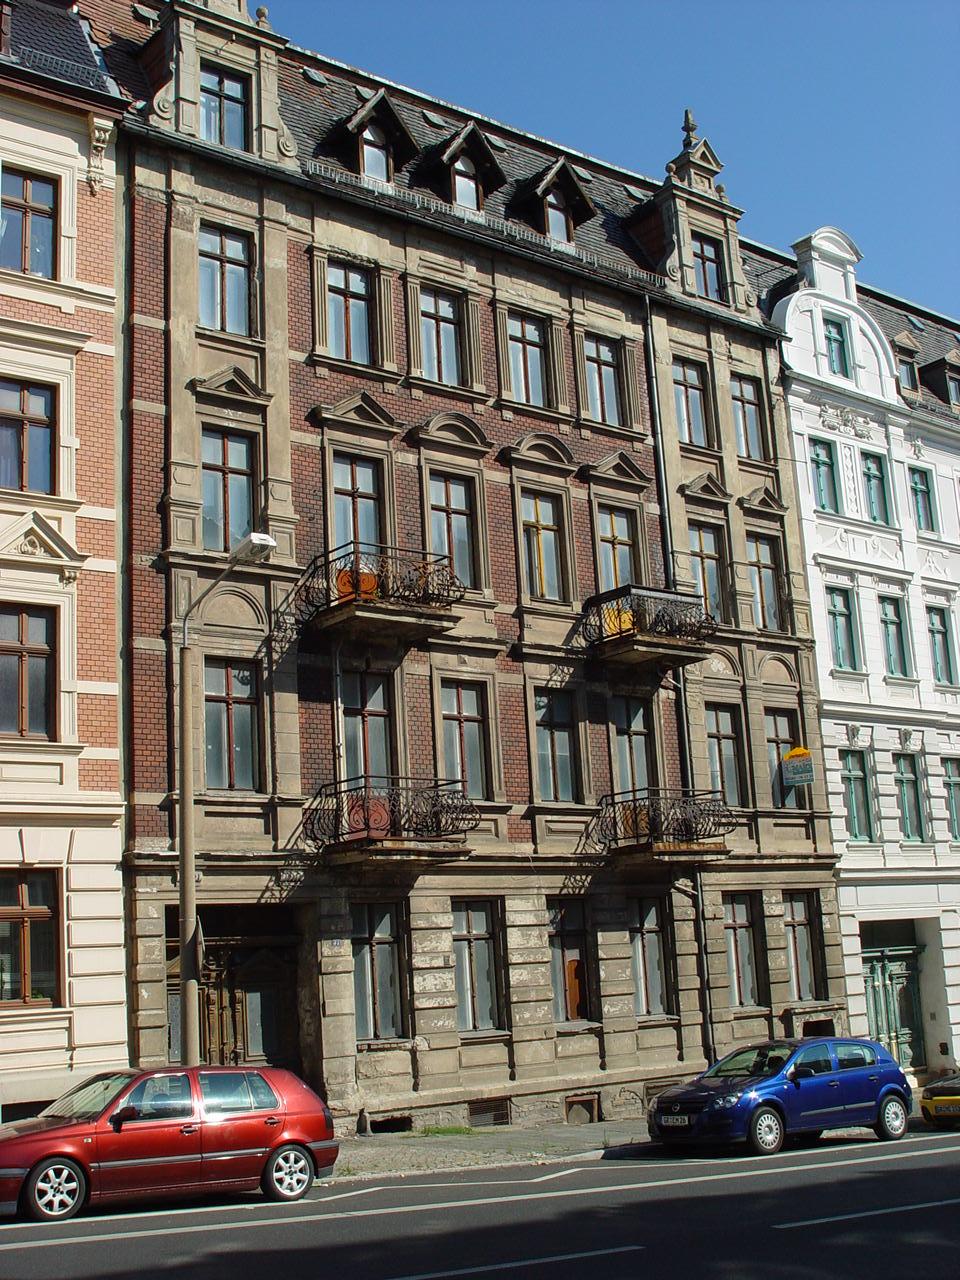 Property For Sale In Gorlitz Germany